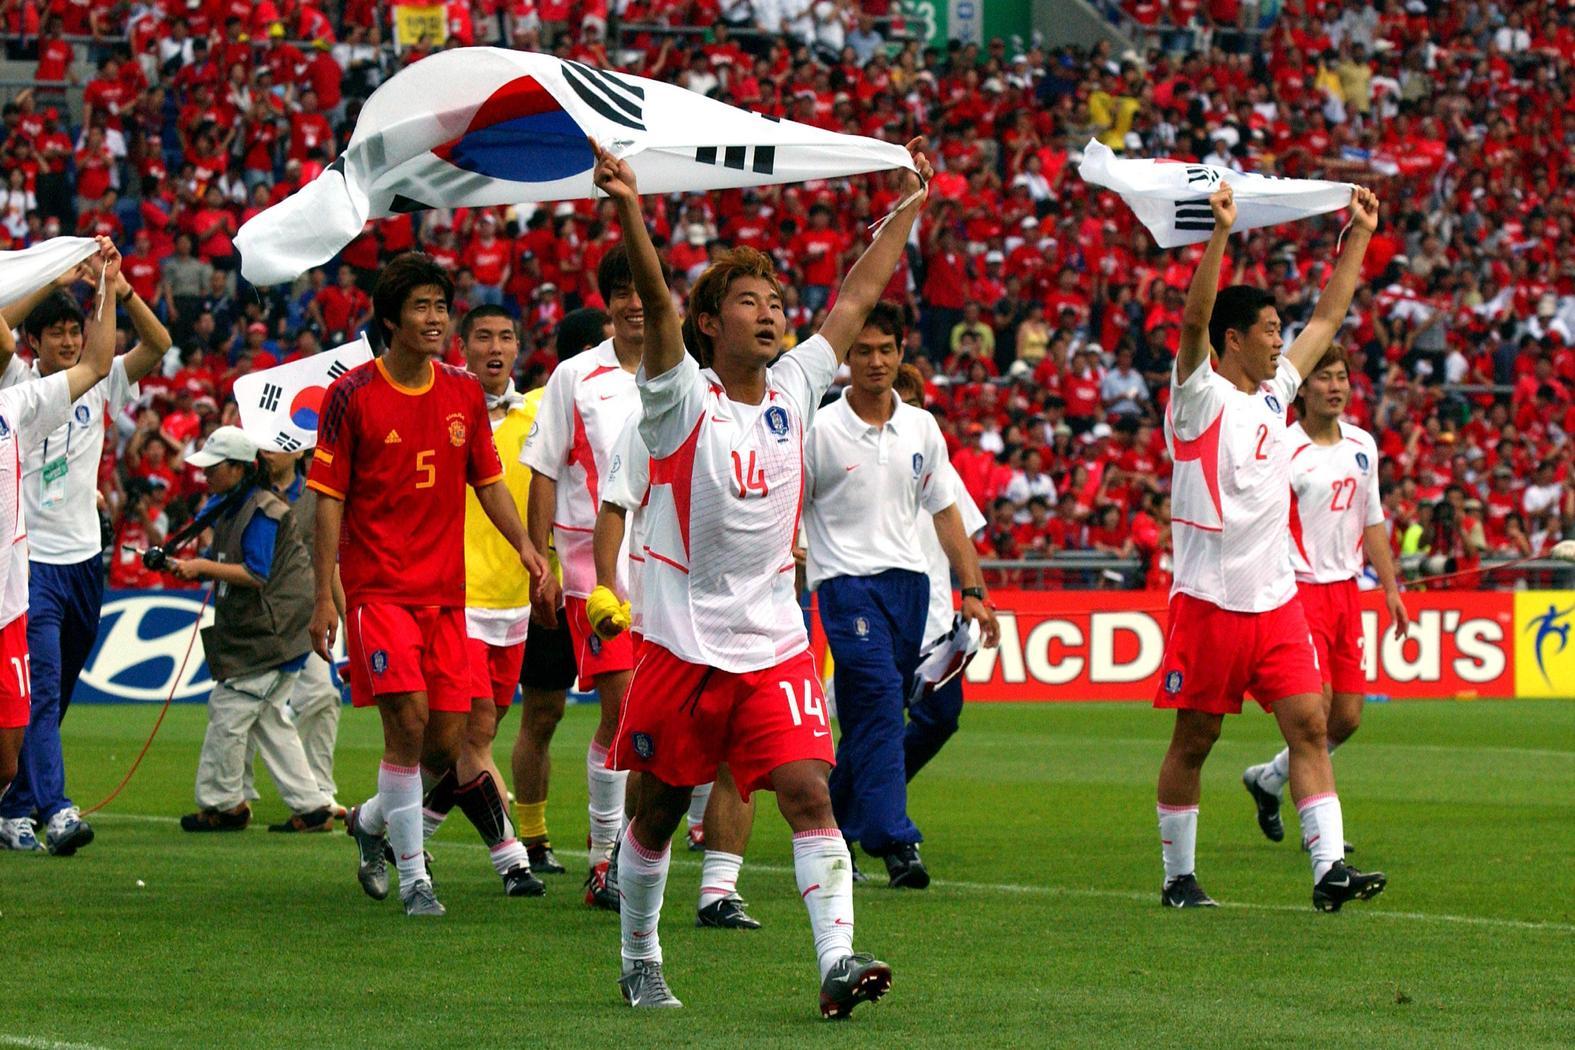 Piala Dunia 2002 Ajang Sepakbola Paling Kontroversial